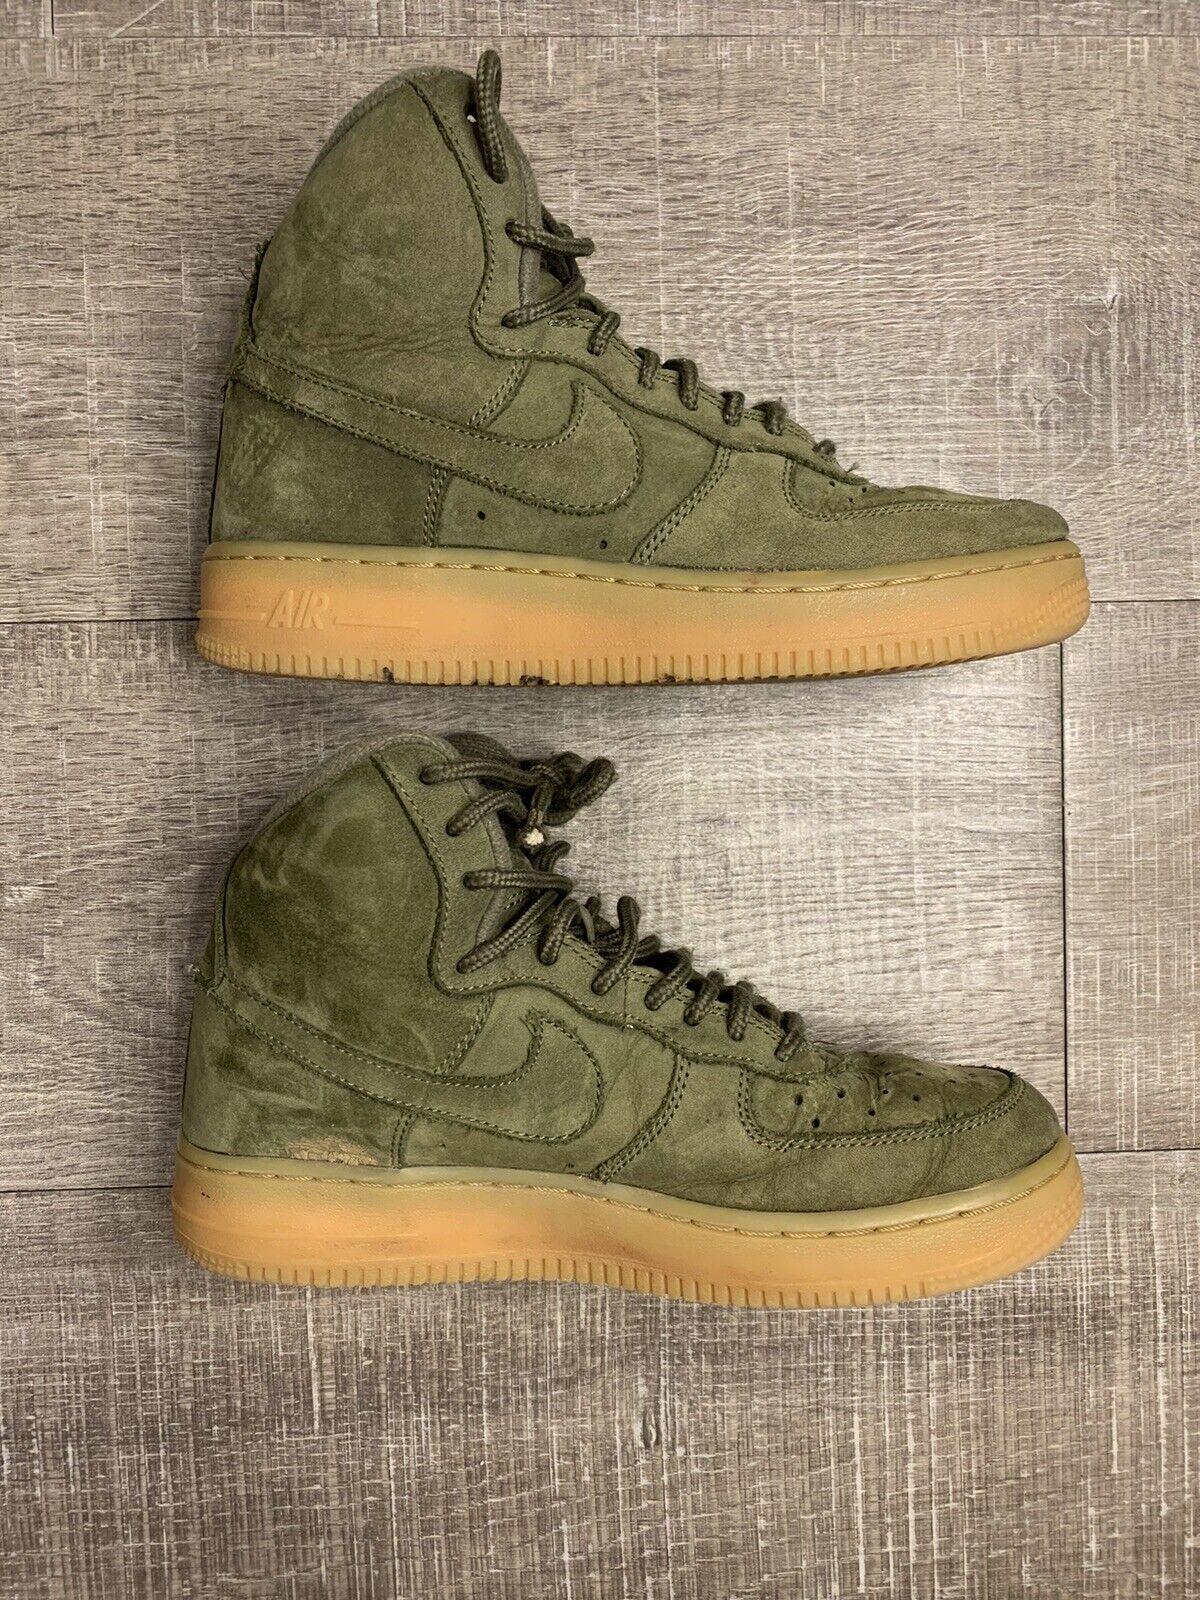 Nike Air Force 1 High Olive Leather AF1